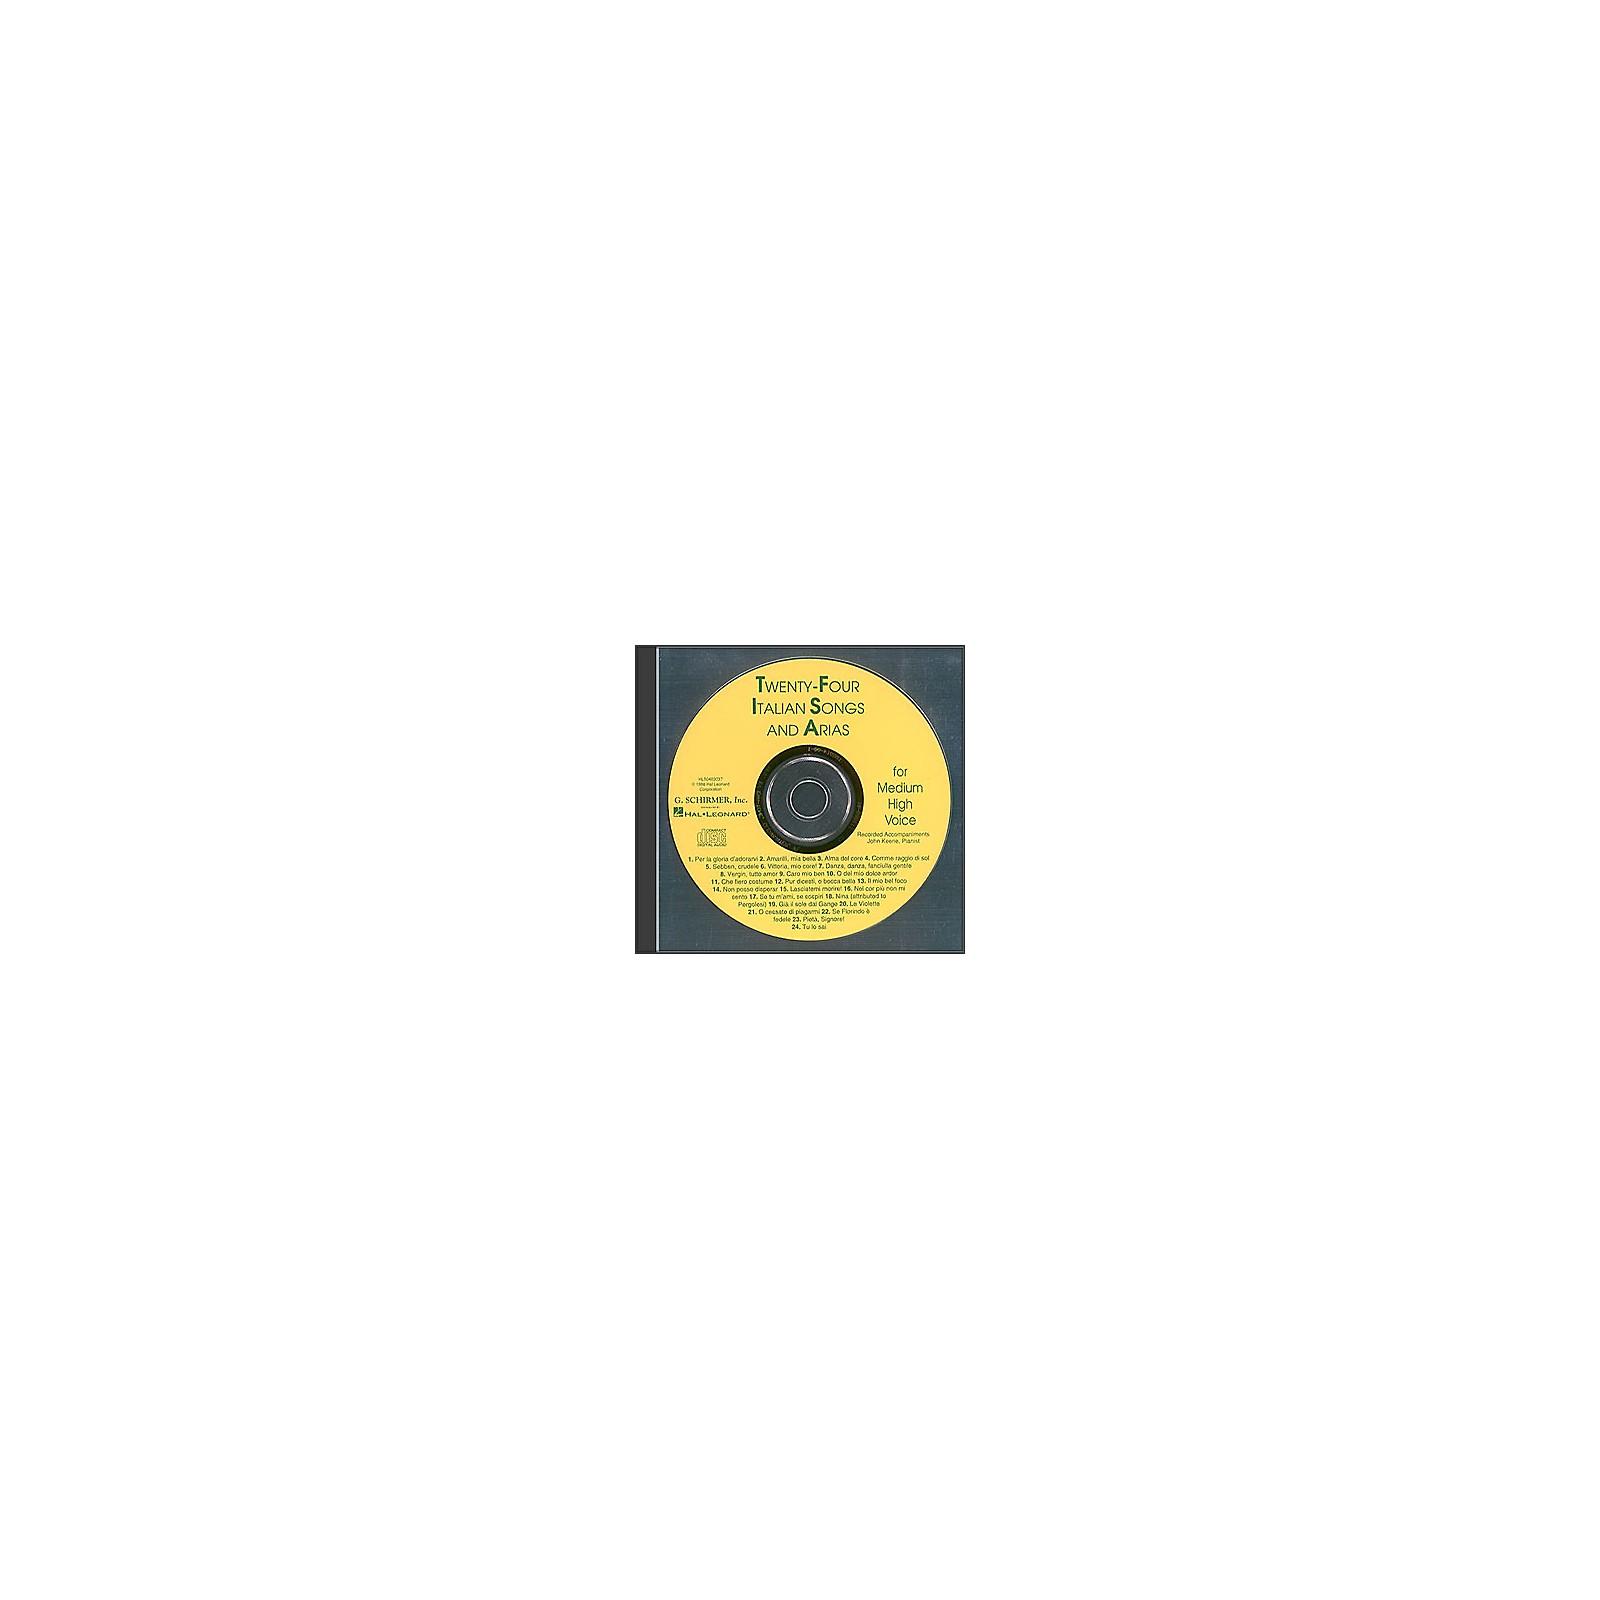 G. Schirmer 24 Italian Songs And Arias for Medium High Accompaniment CD